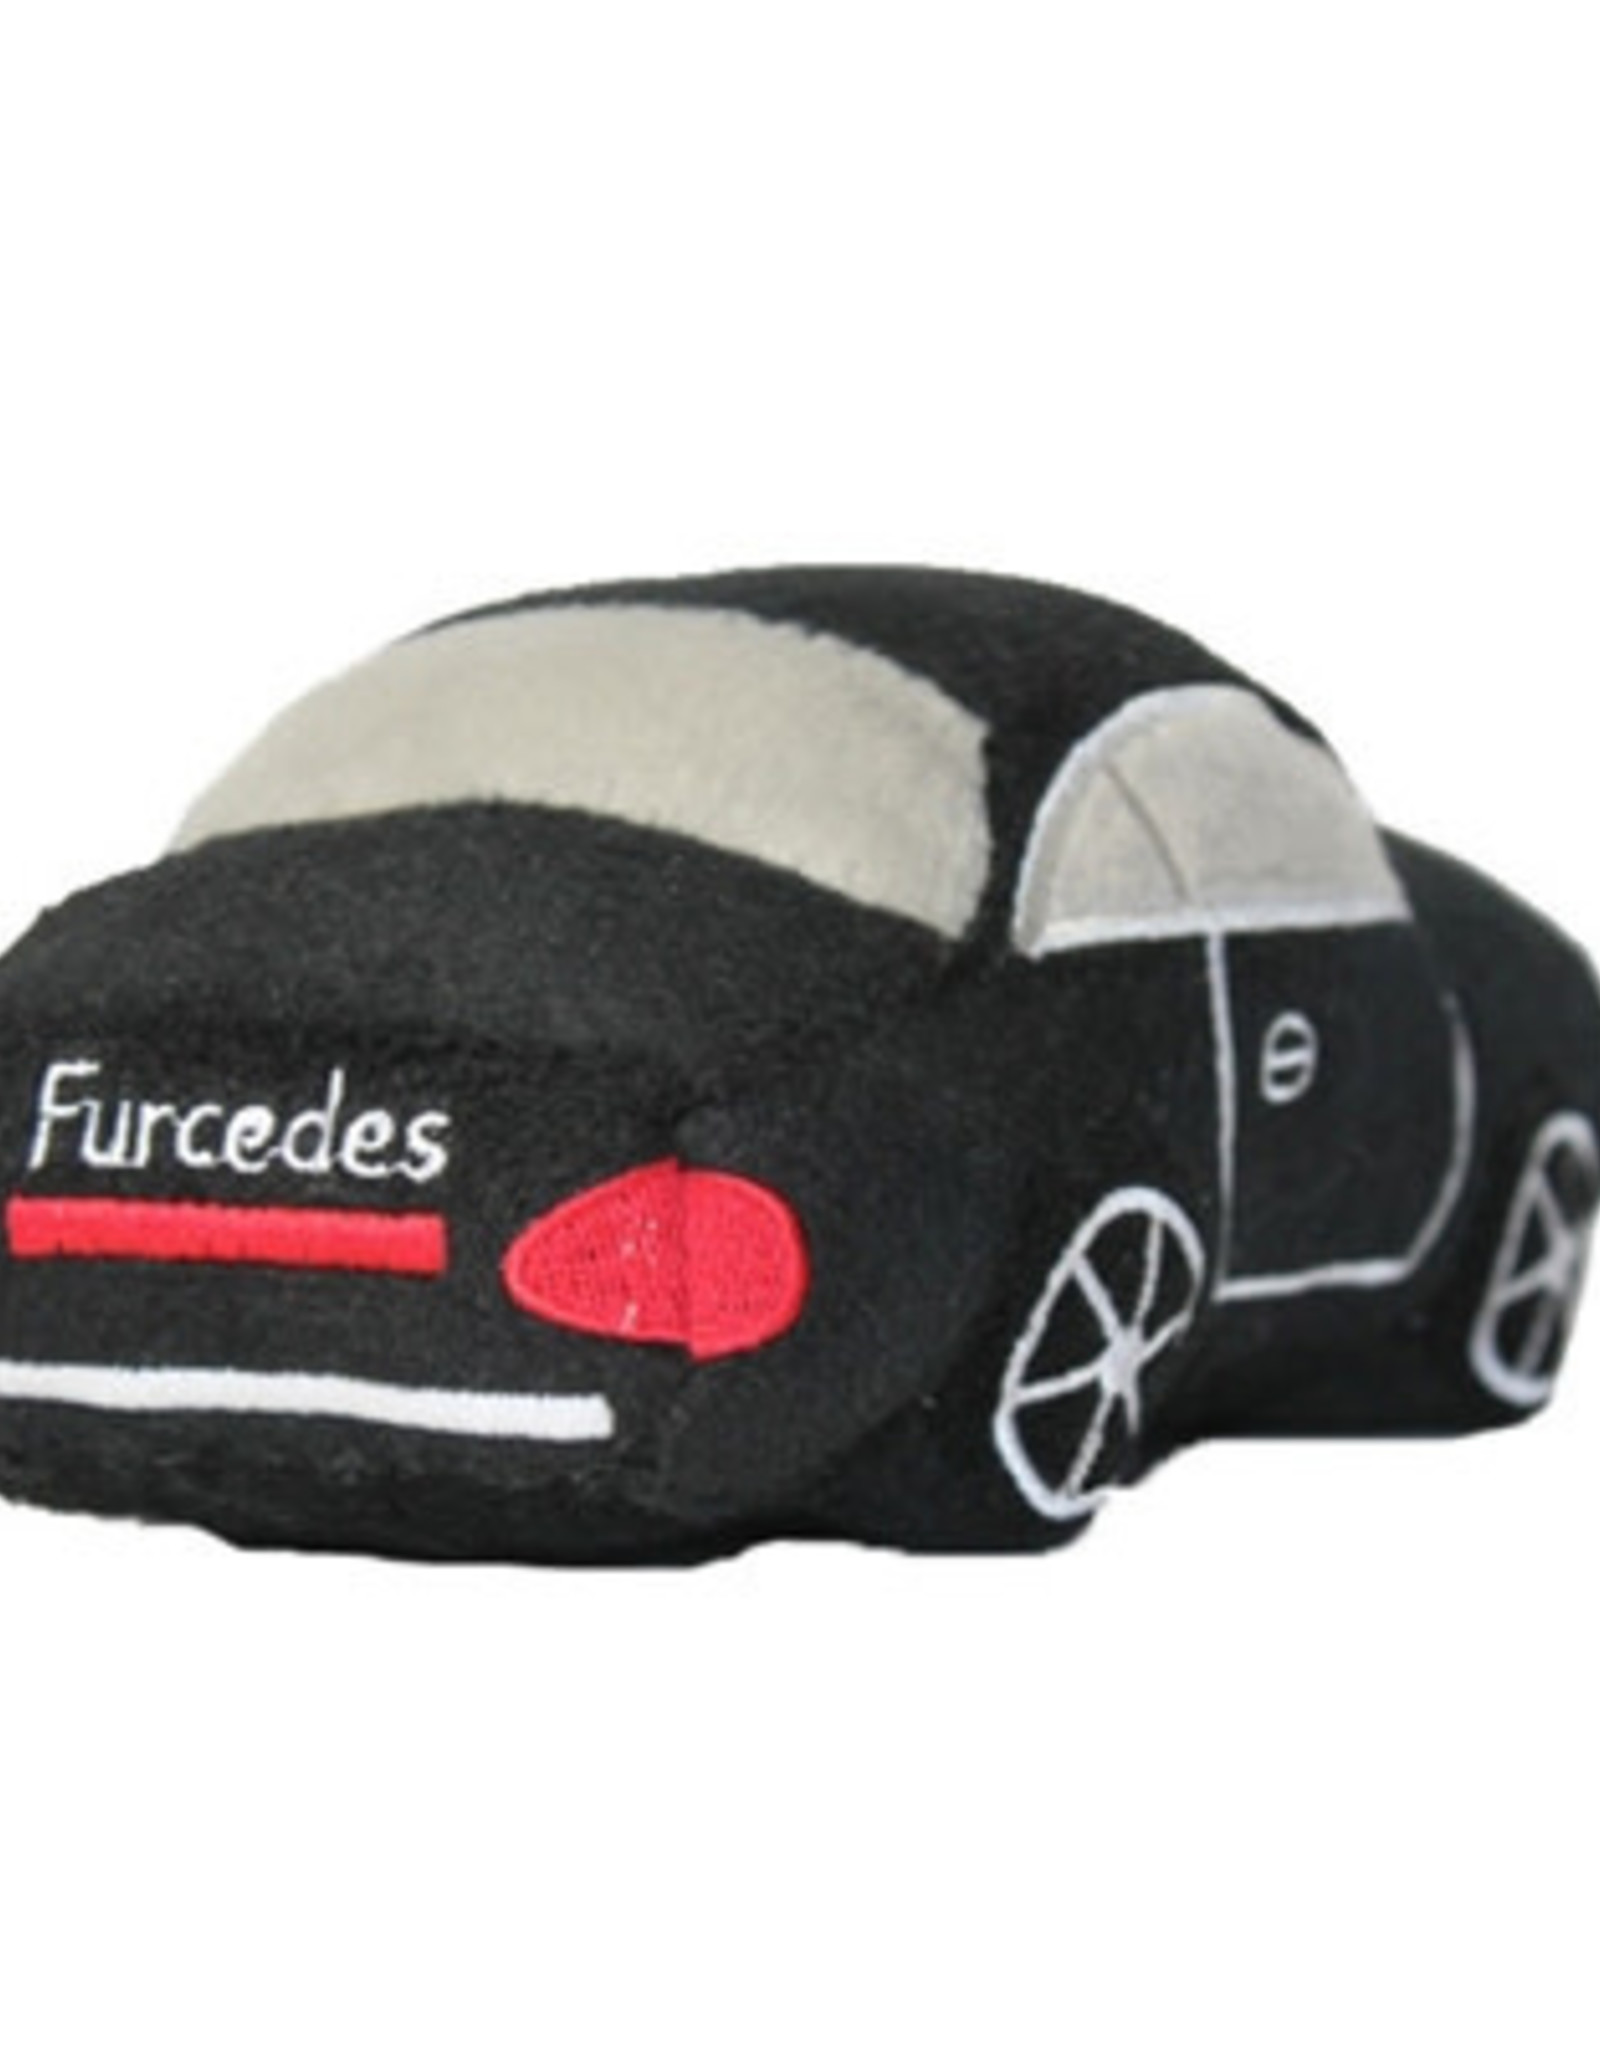 Haute Diggity Dog Furcedes Car Toy